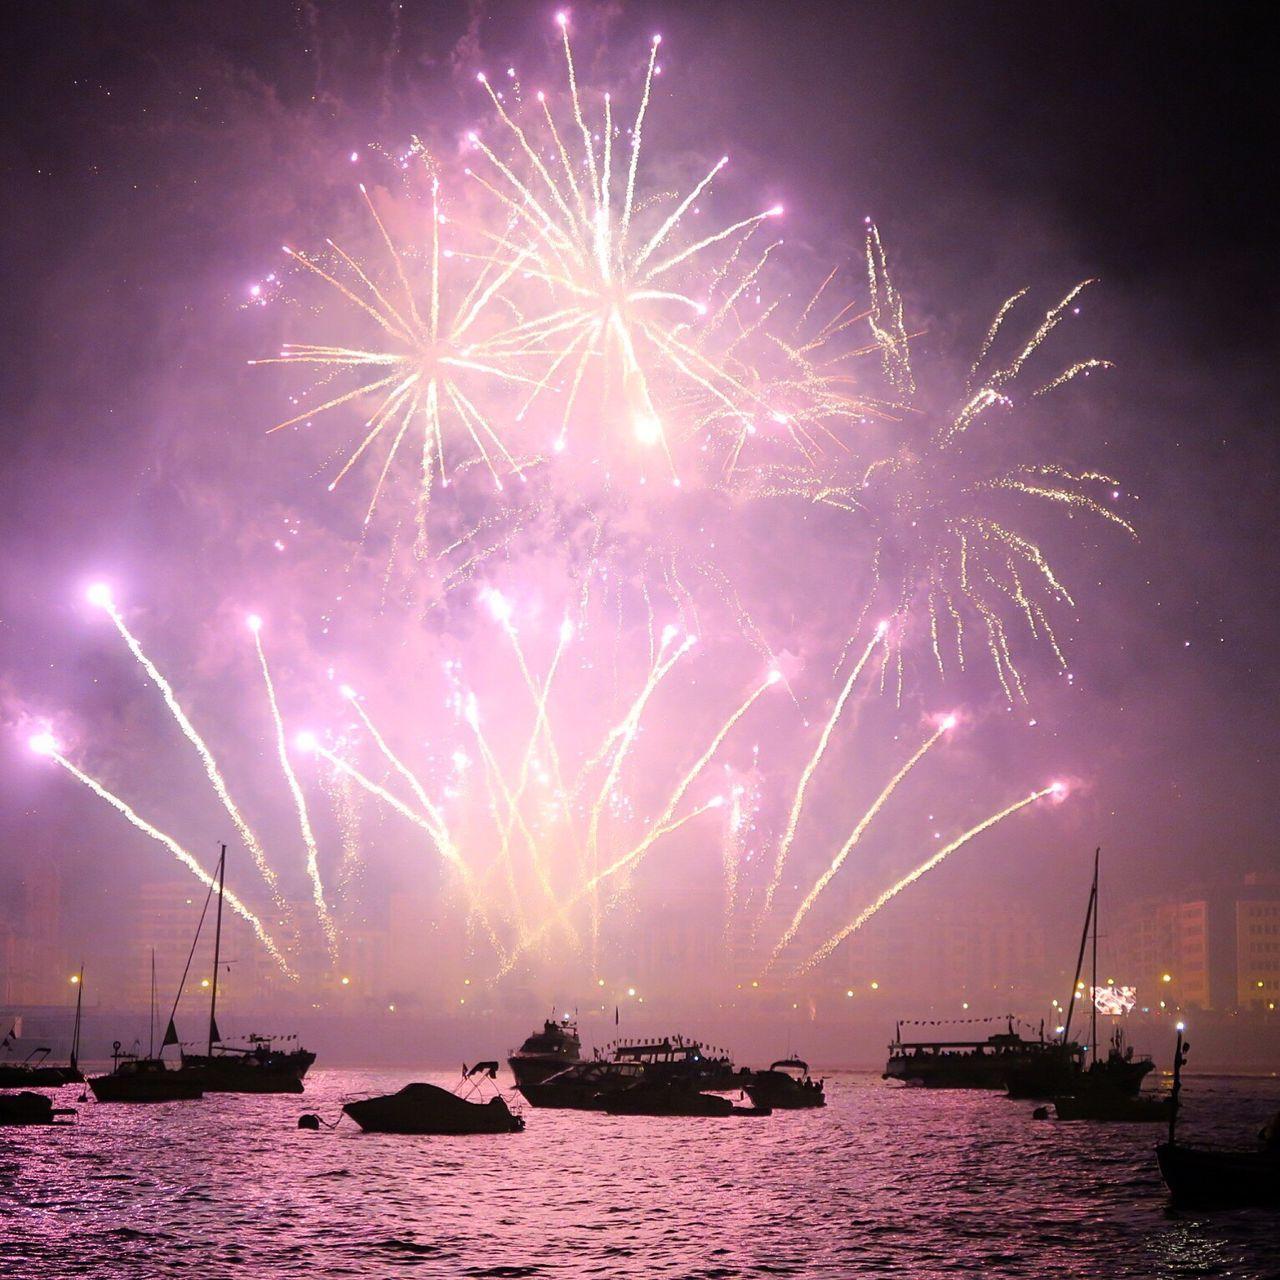 night, celebration, firework display, firework - man made object, nautical vessel, exploding, sky, no people, sea, awe, outdoors, illuminated, scenics, water